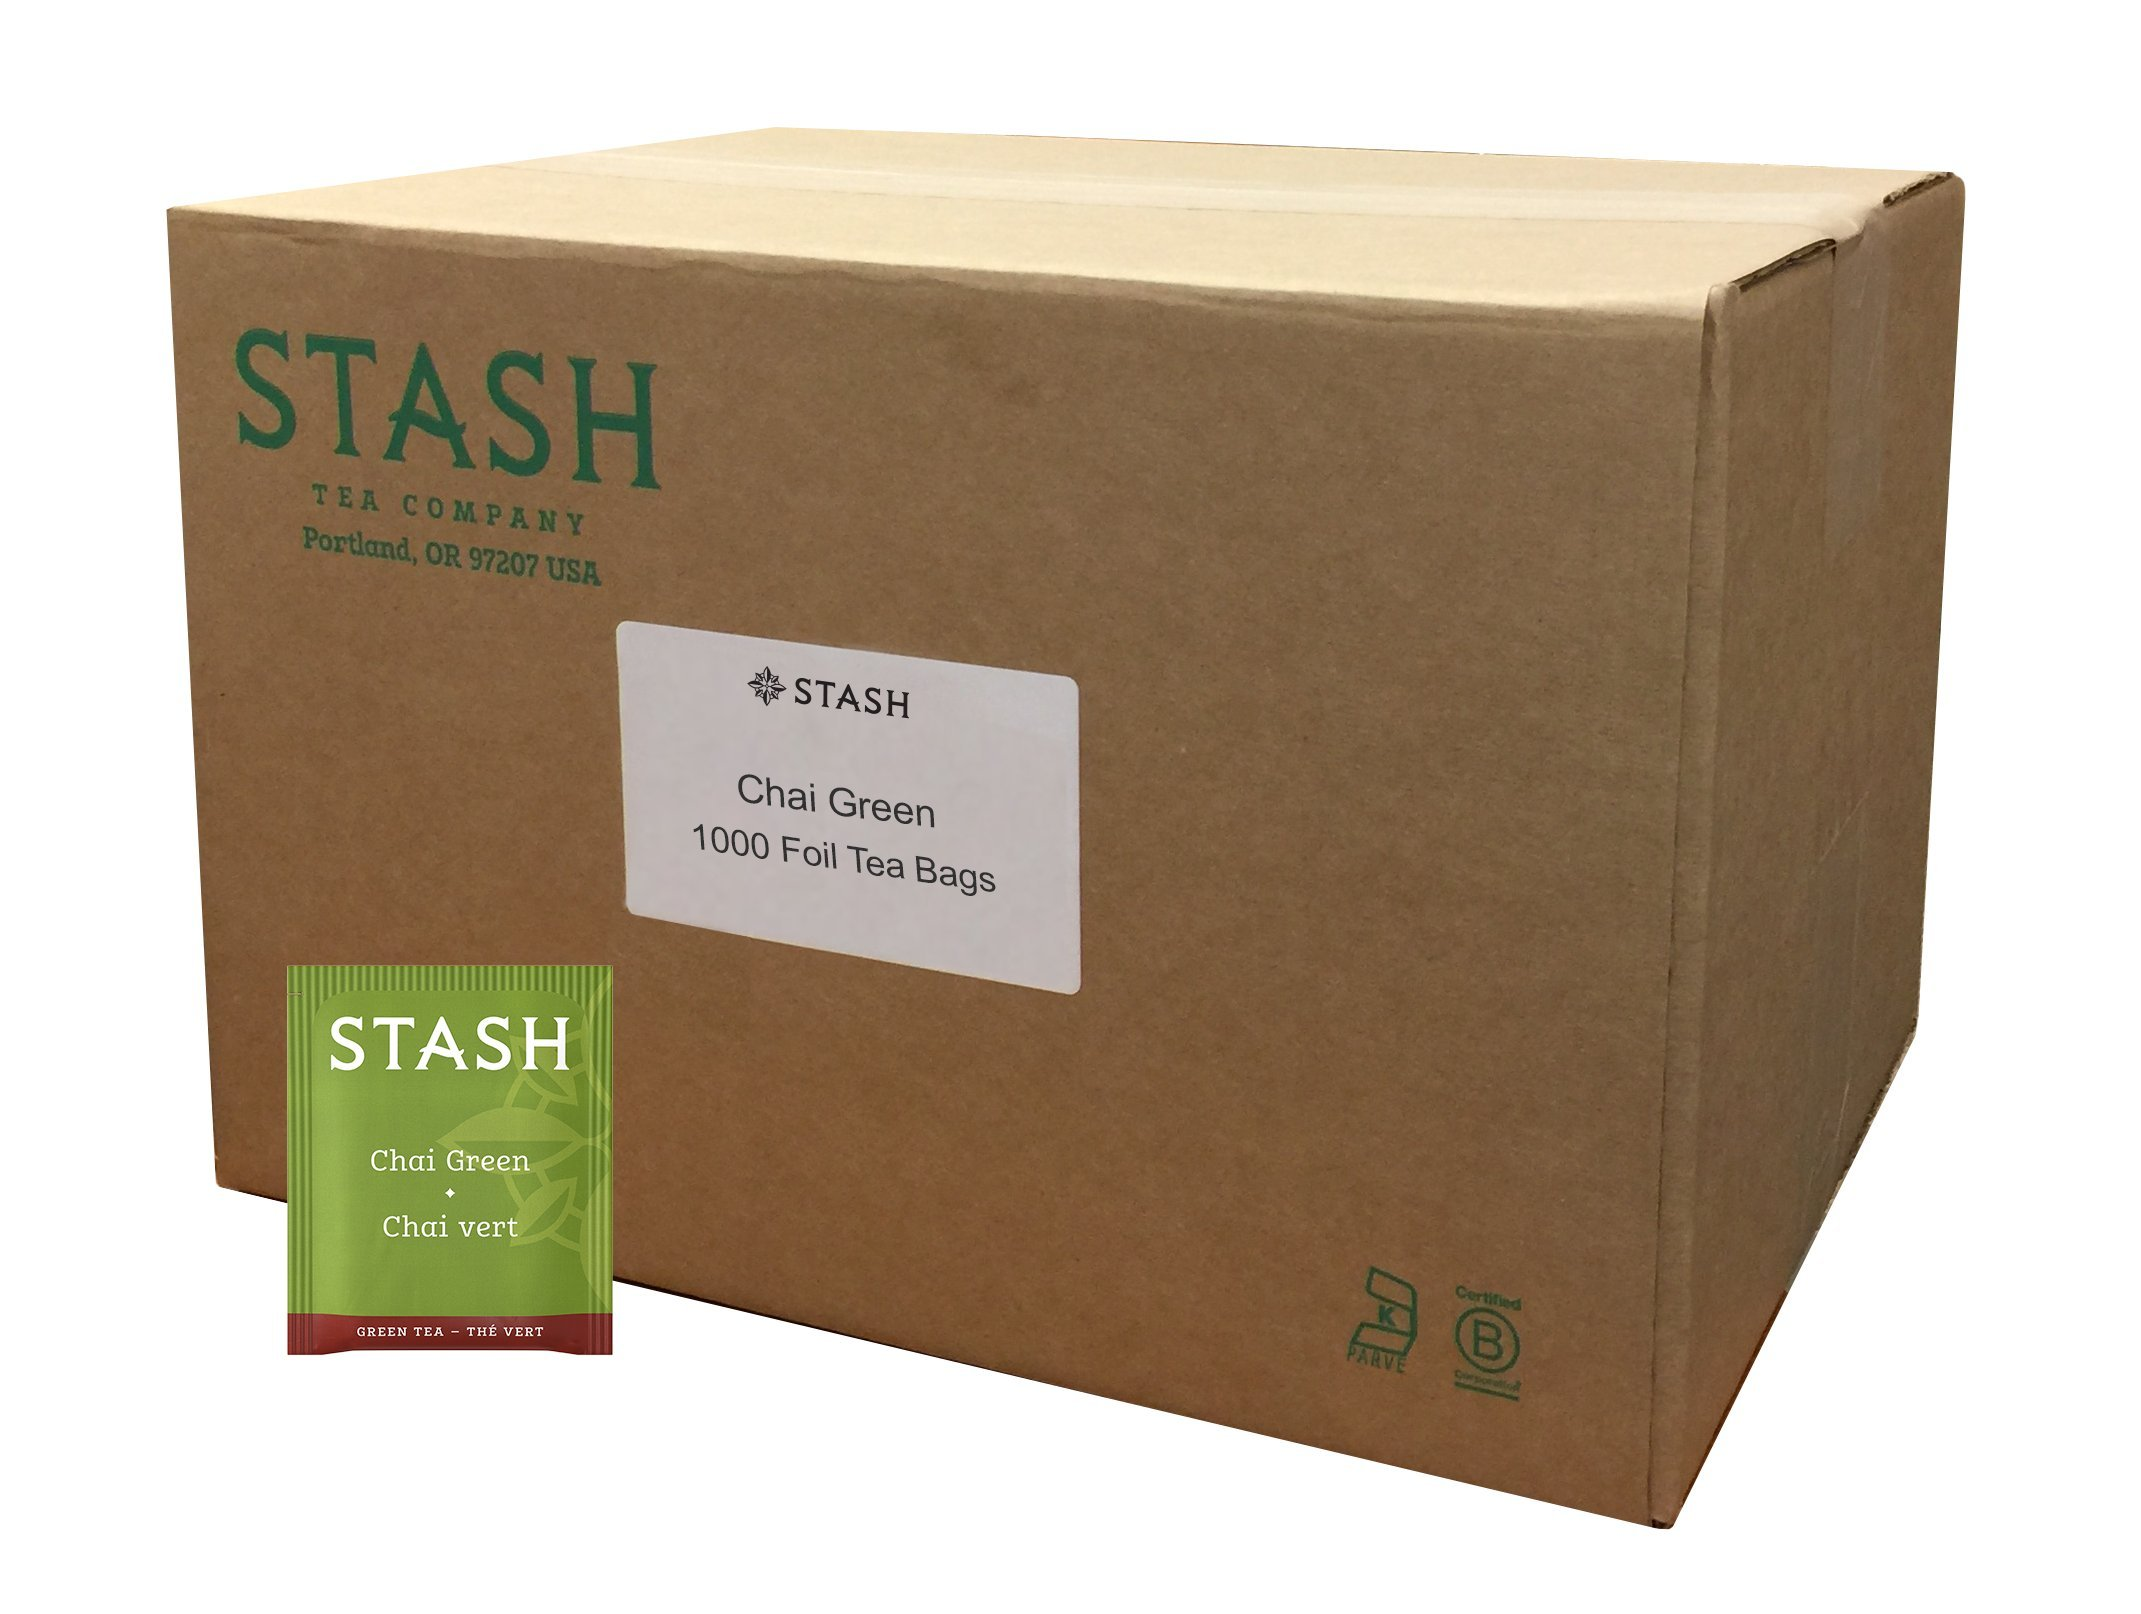 Stash Tea Green Chai Tea 1000 Count Tea Bags in Foil  Individual Spiced Green Tea Bags for Use in Teapots Mugs or Teacups, Brew Hot Tea or Iced Tea, Add Milk for Chai Latte by Stash Tea (Image #1)